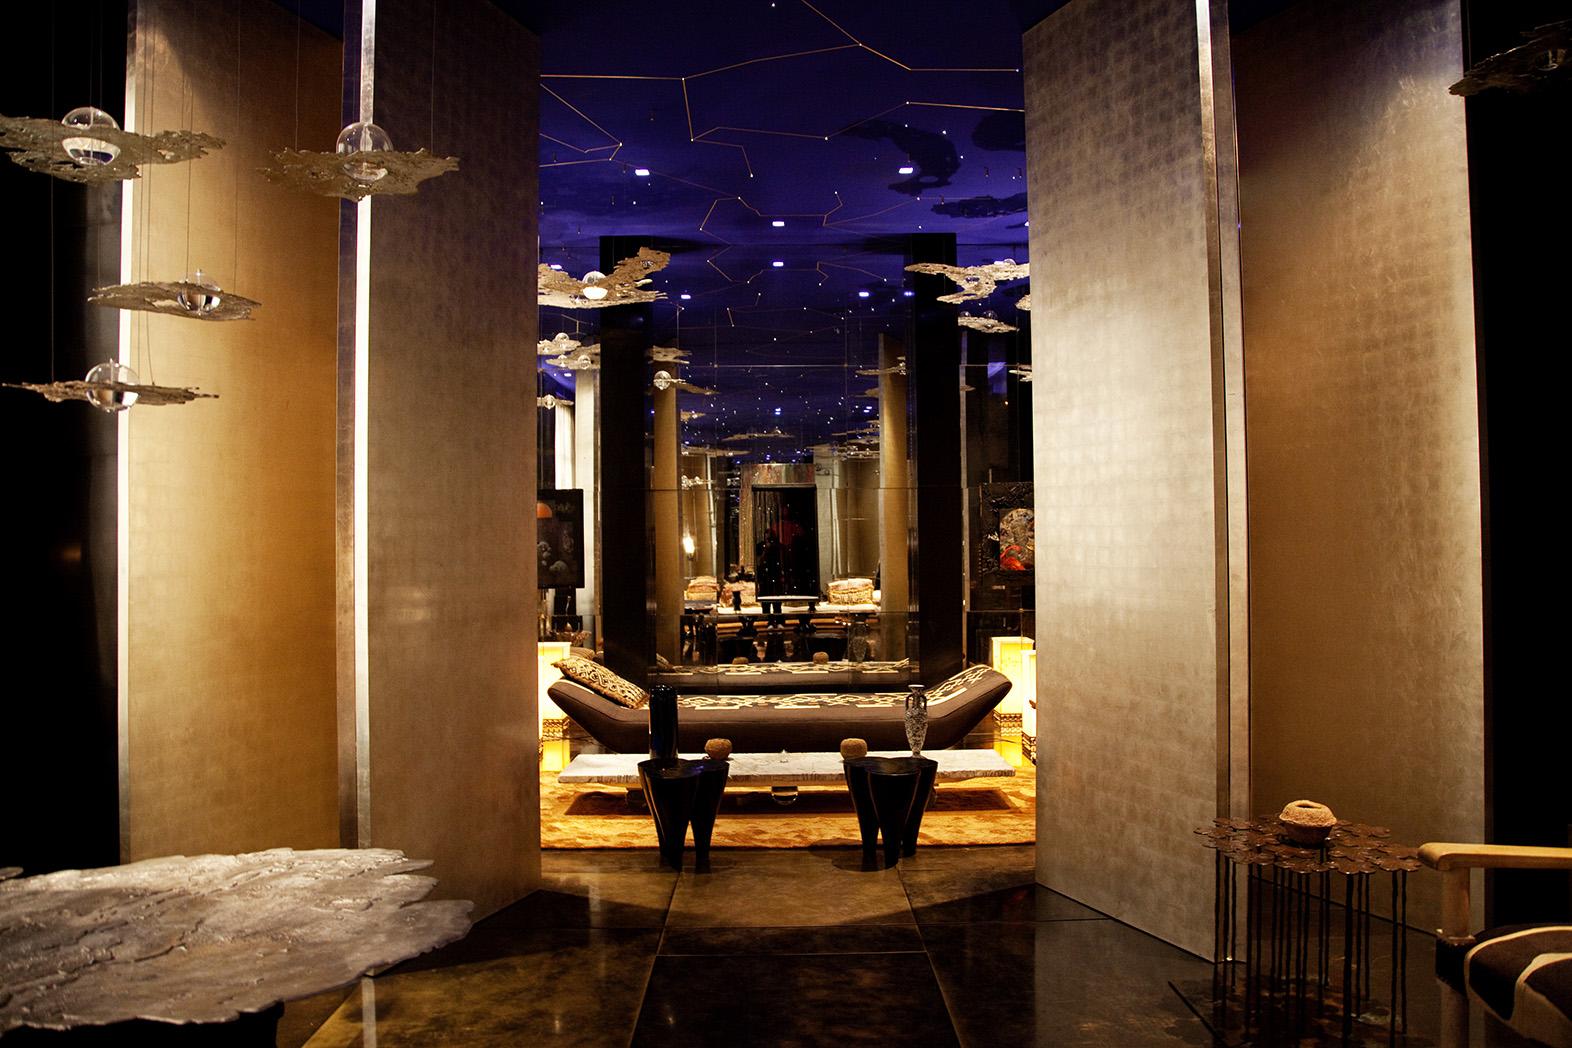 1925 Rolls Royce Phantom >> loveisspeed.......: JACQUES GARCIA - ARCHITECT AND INTERIOR DESIGNER PARIS...Best of the best ...